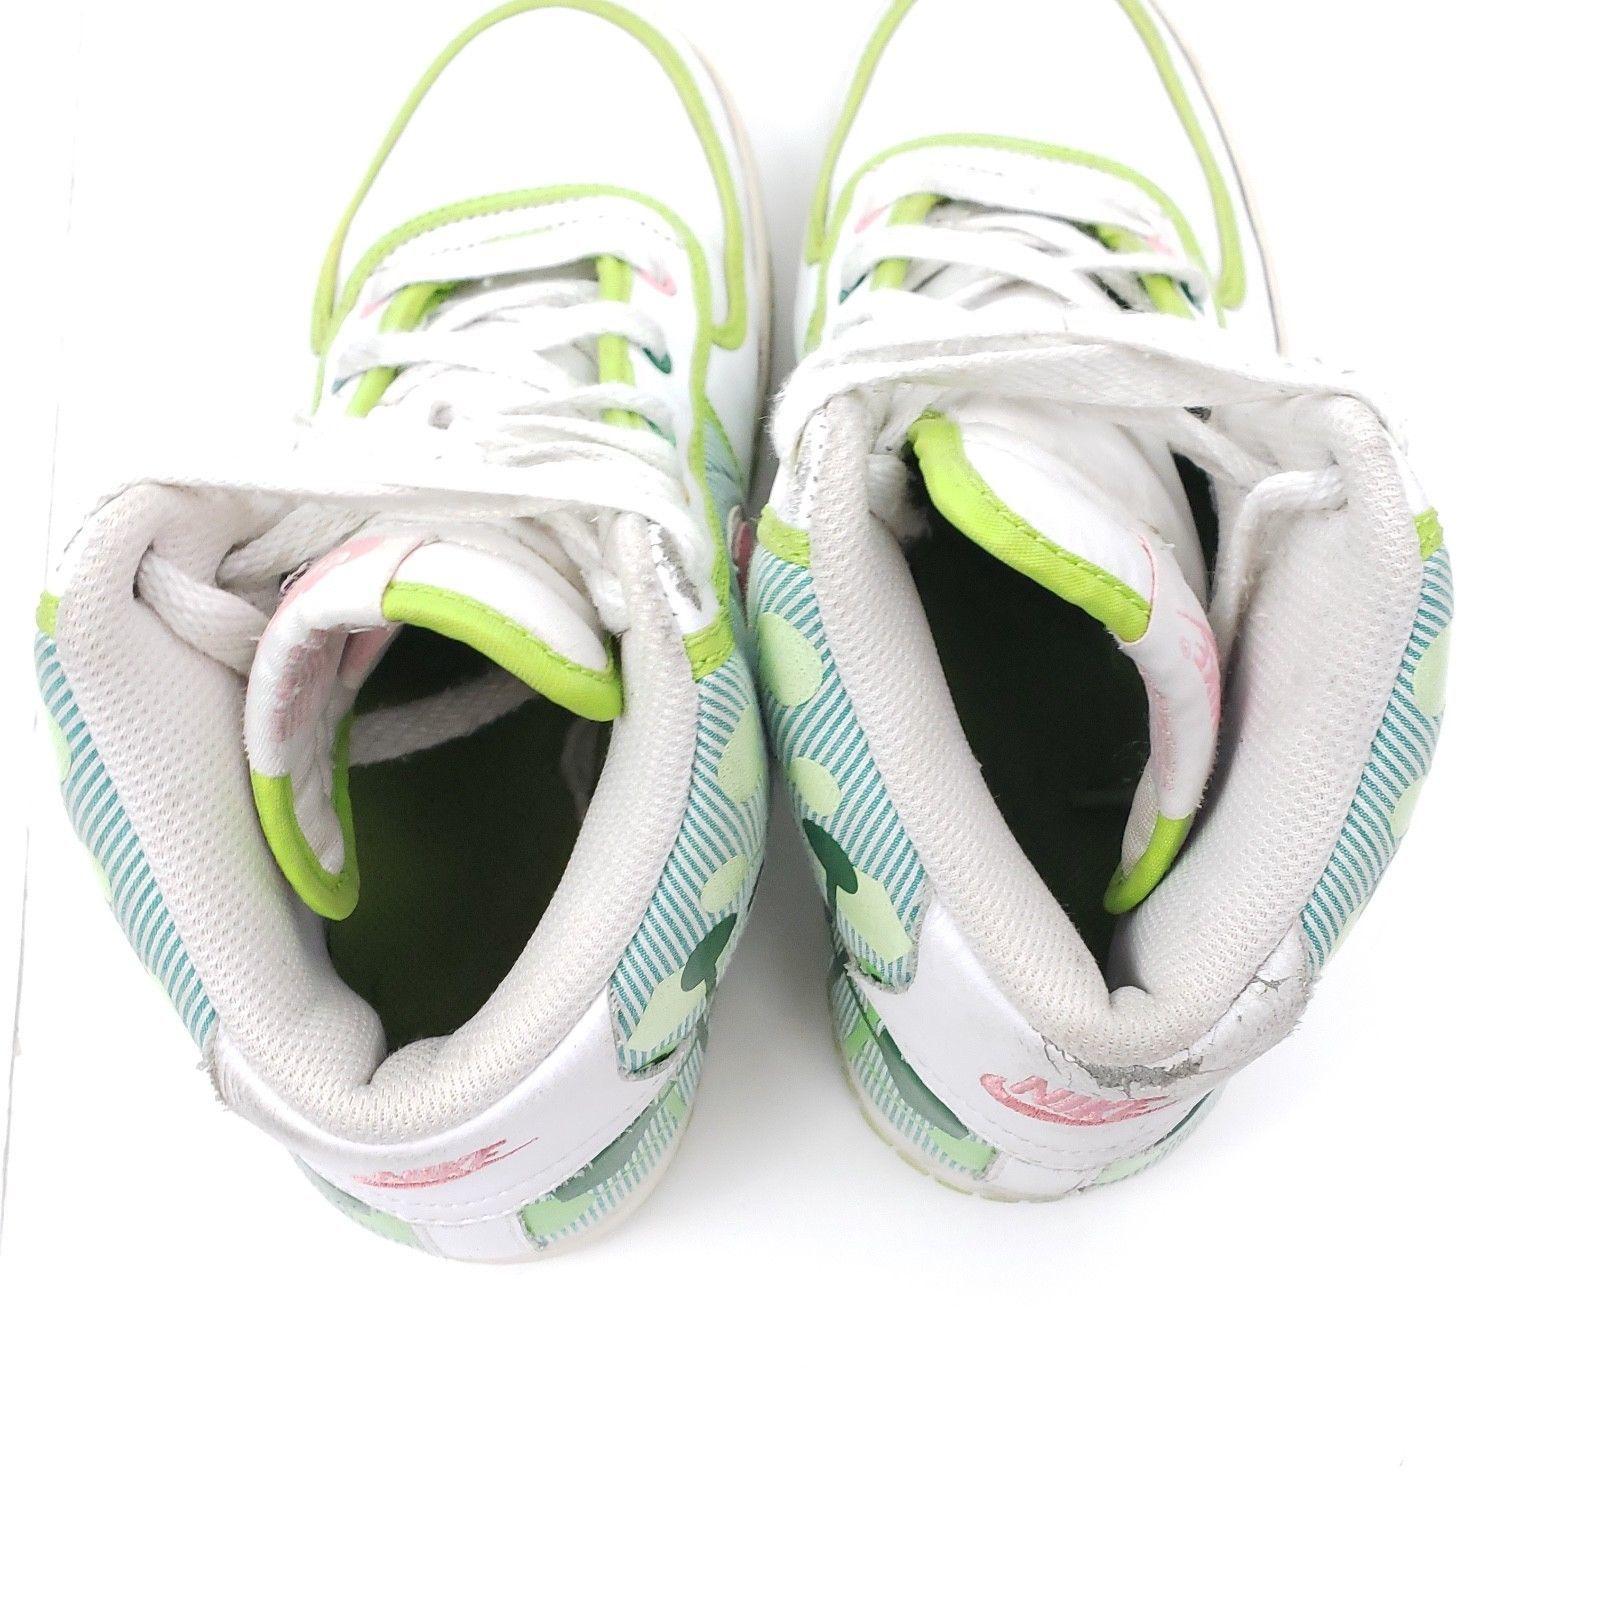 Nike White/Green/Pink Vandal High Sneakers 317038-161: Sz 5Y, 6.5W